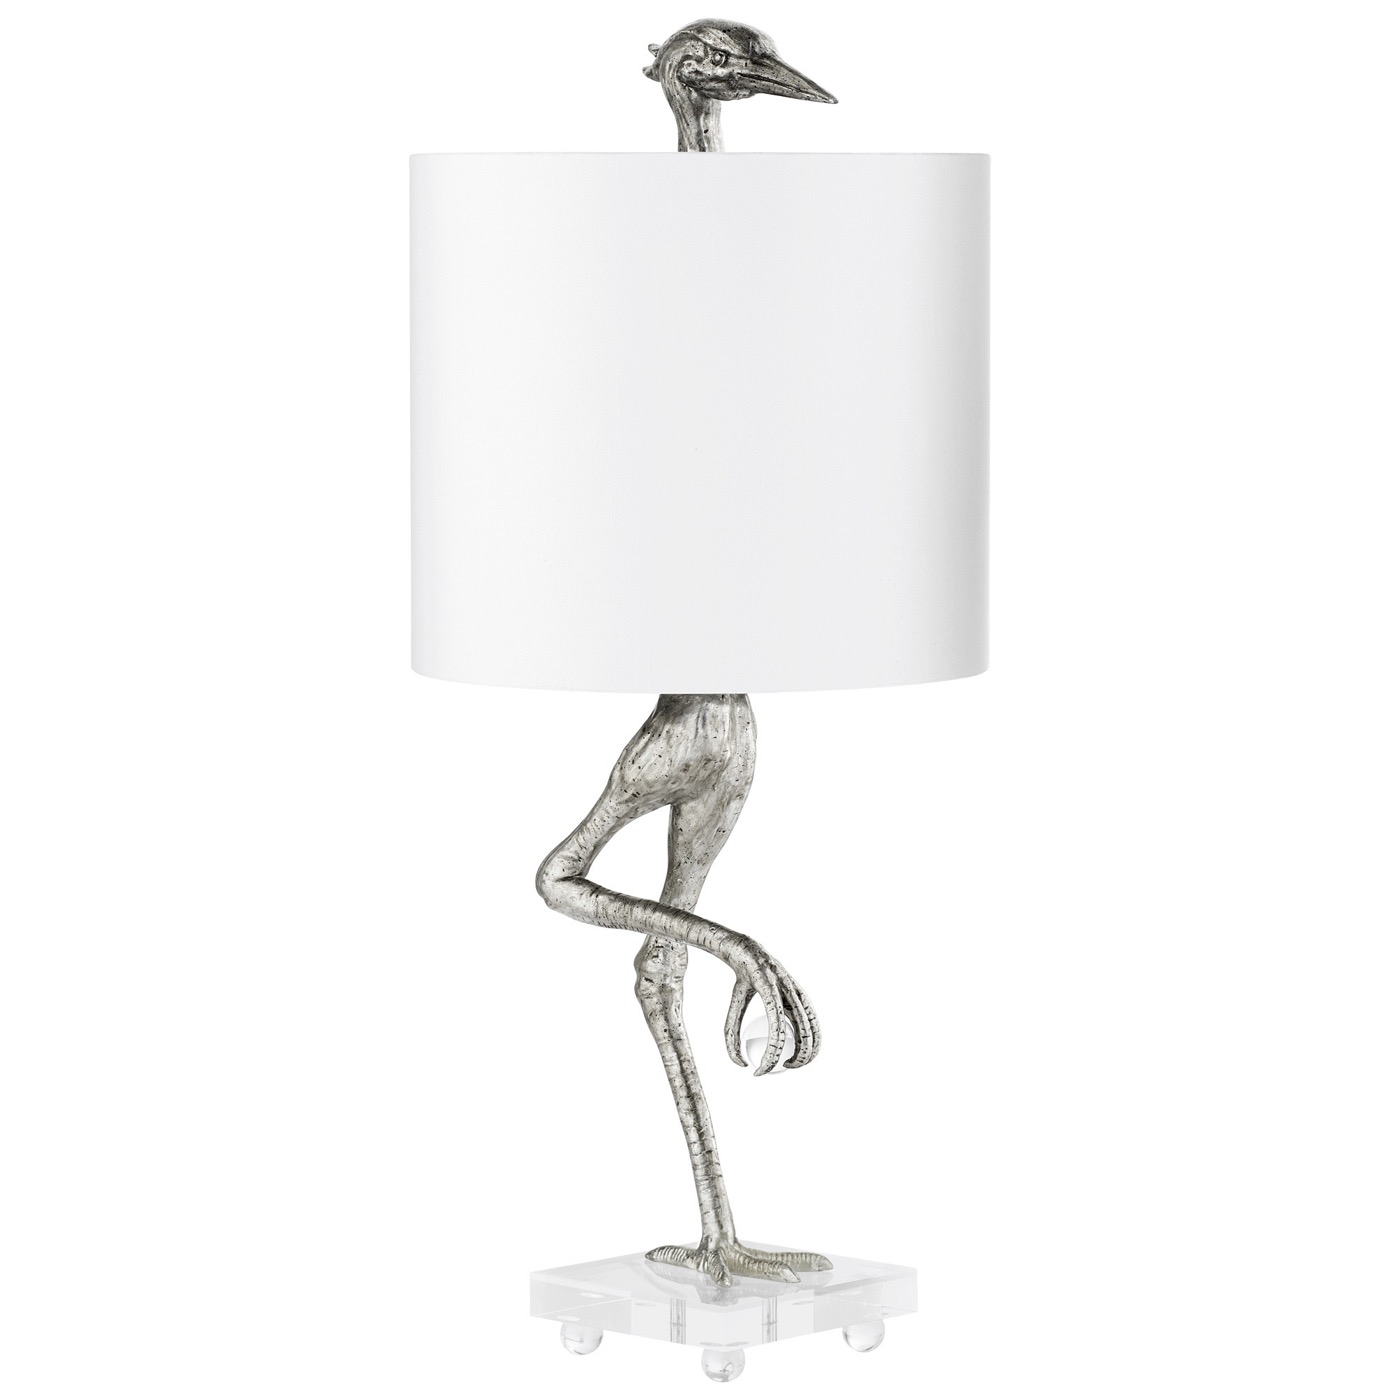 Canard Table Lamp | Silver